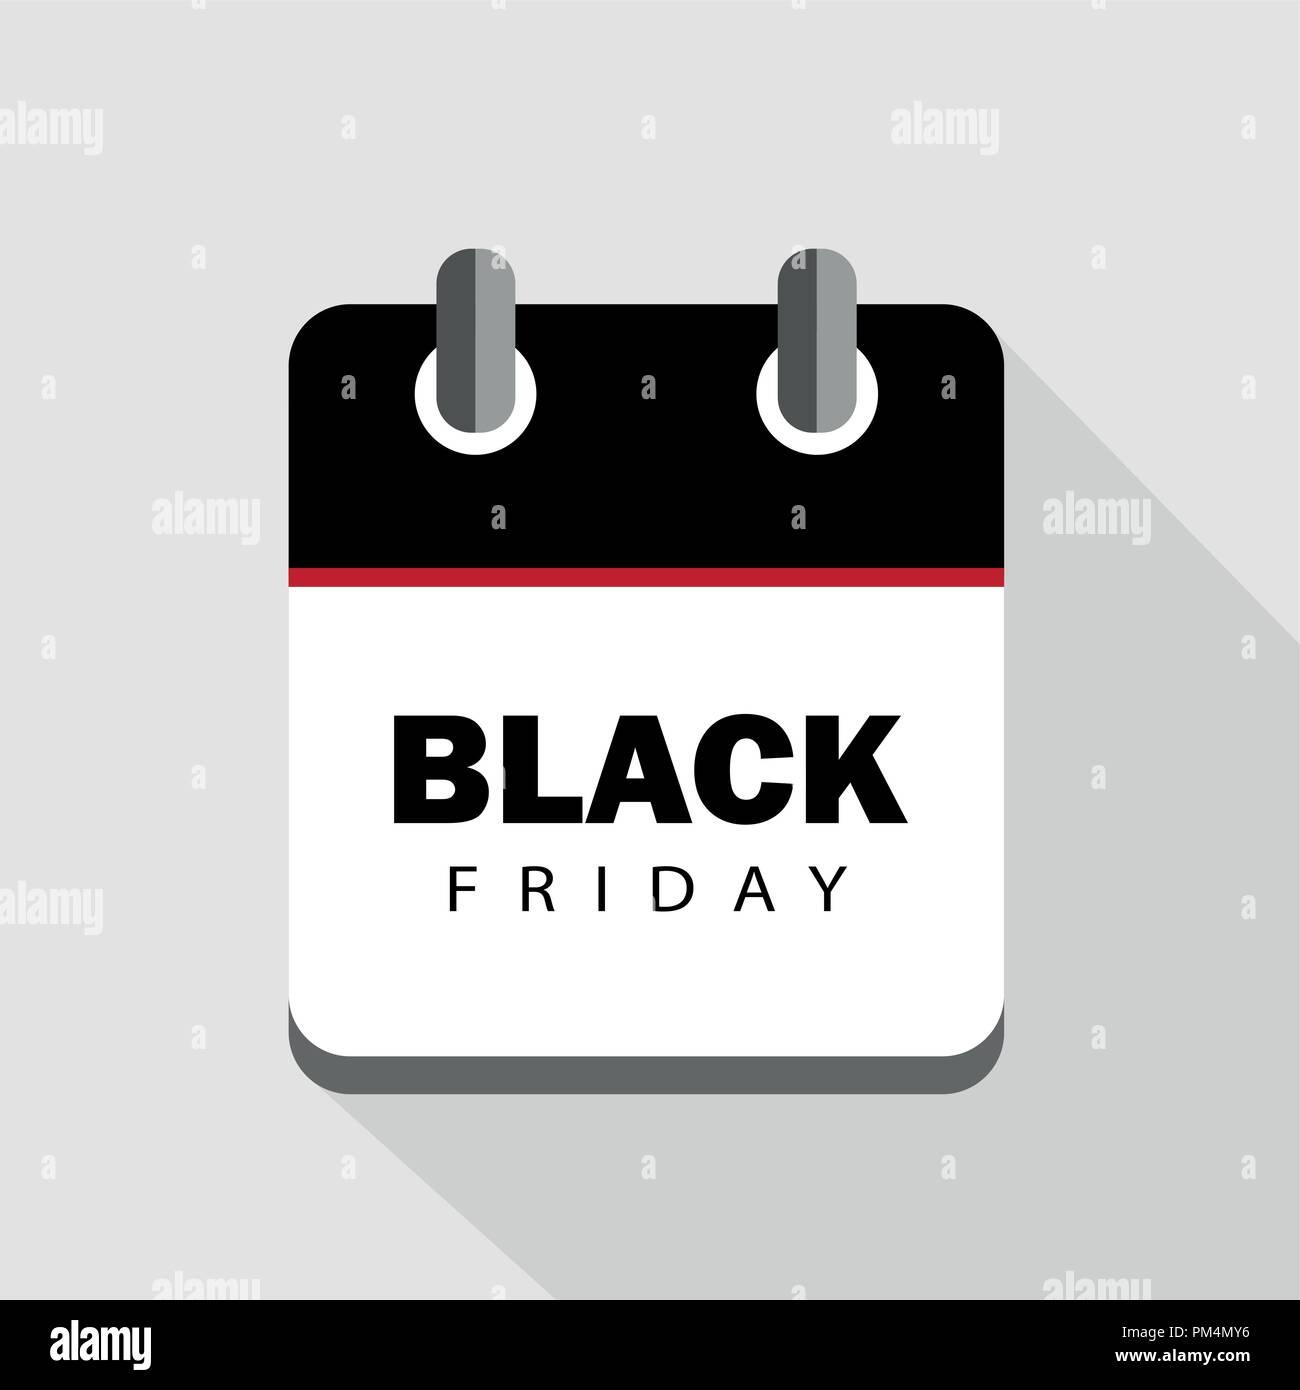 Black Friday sale calendar advertising vector illustration - Stock Vector